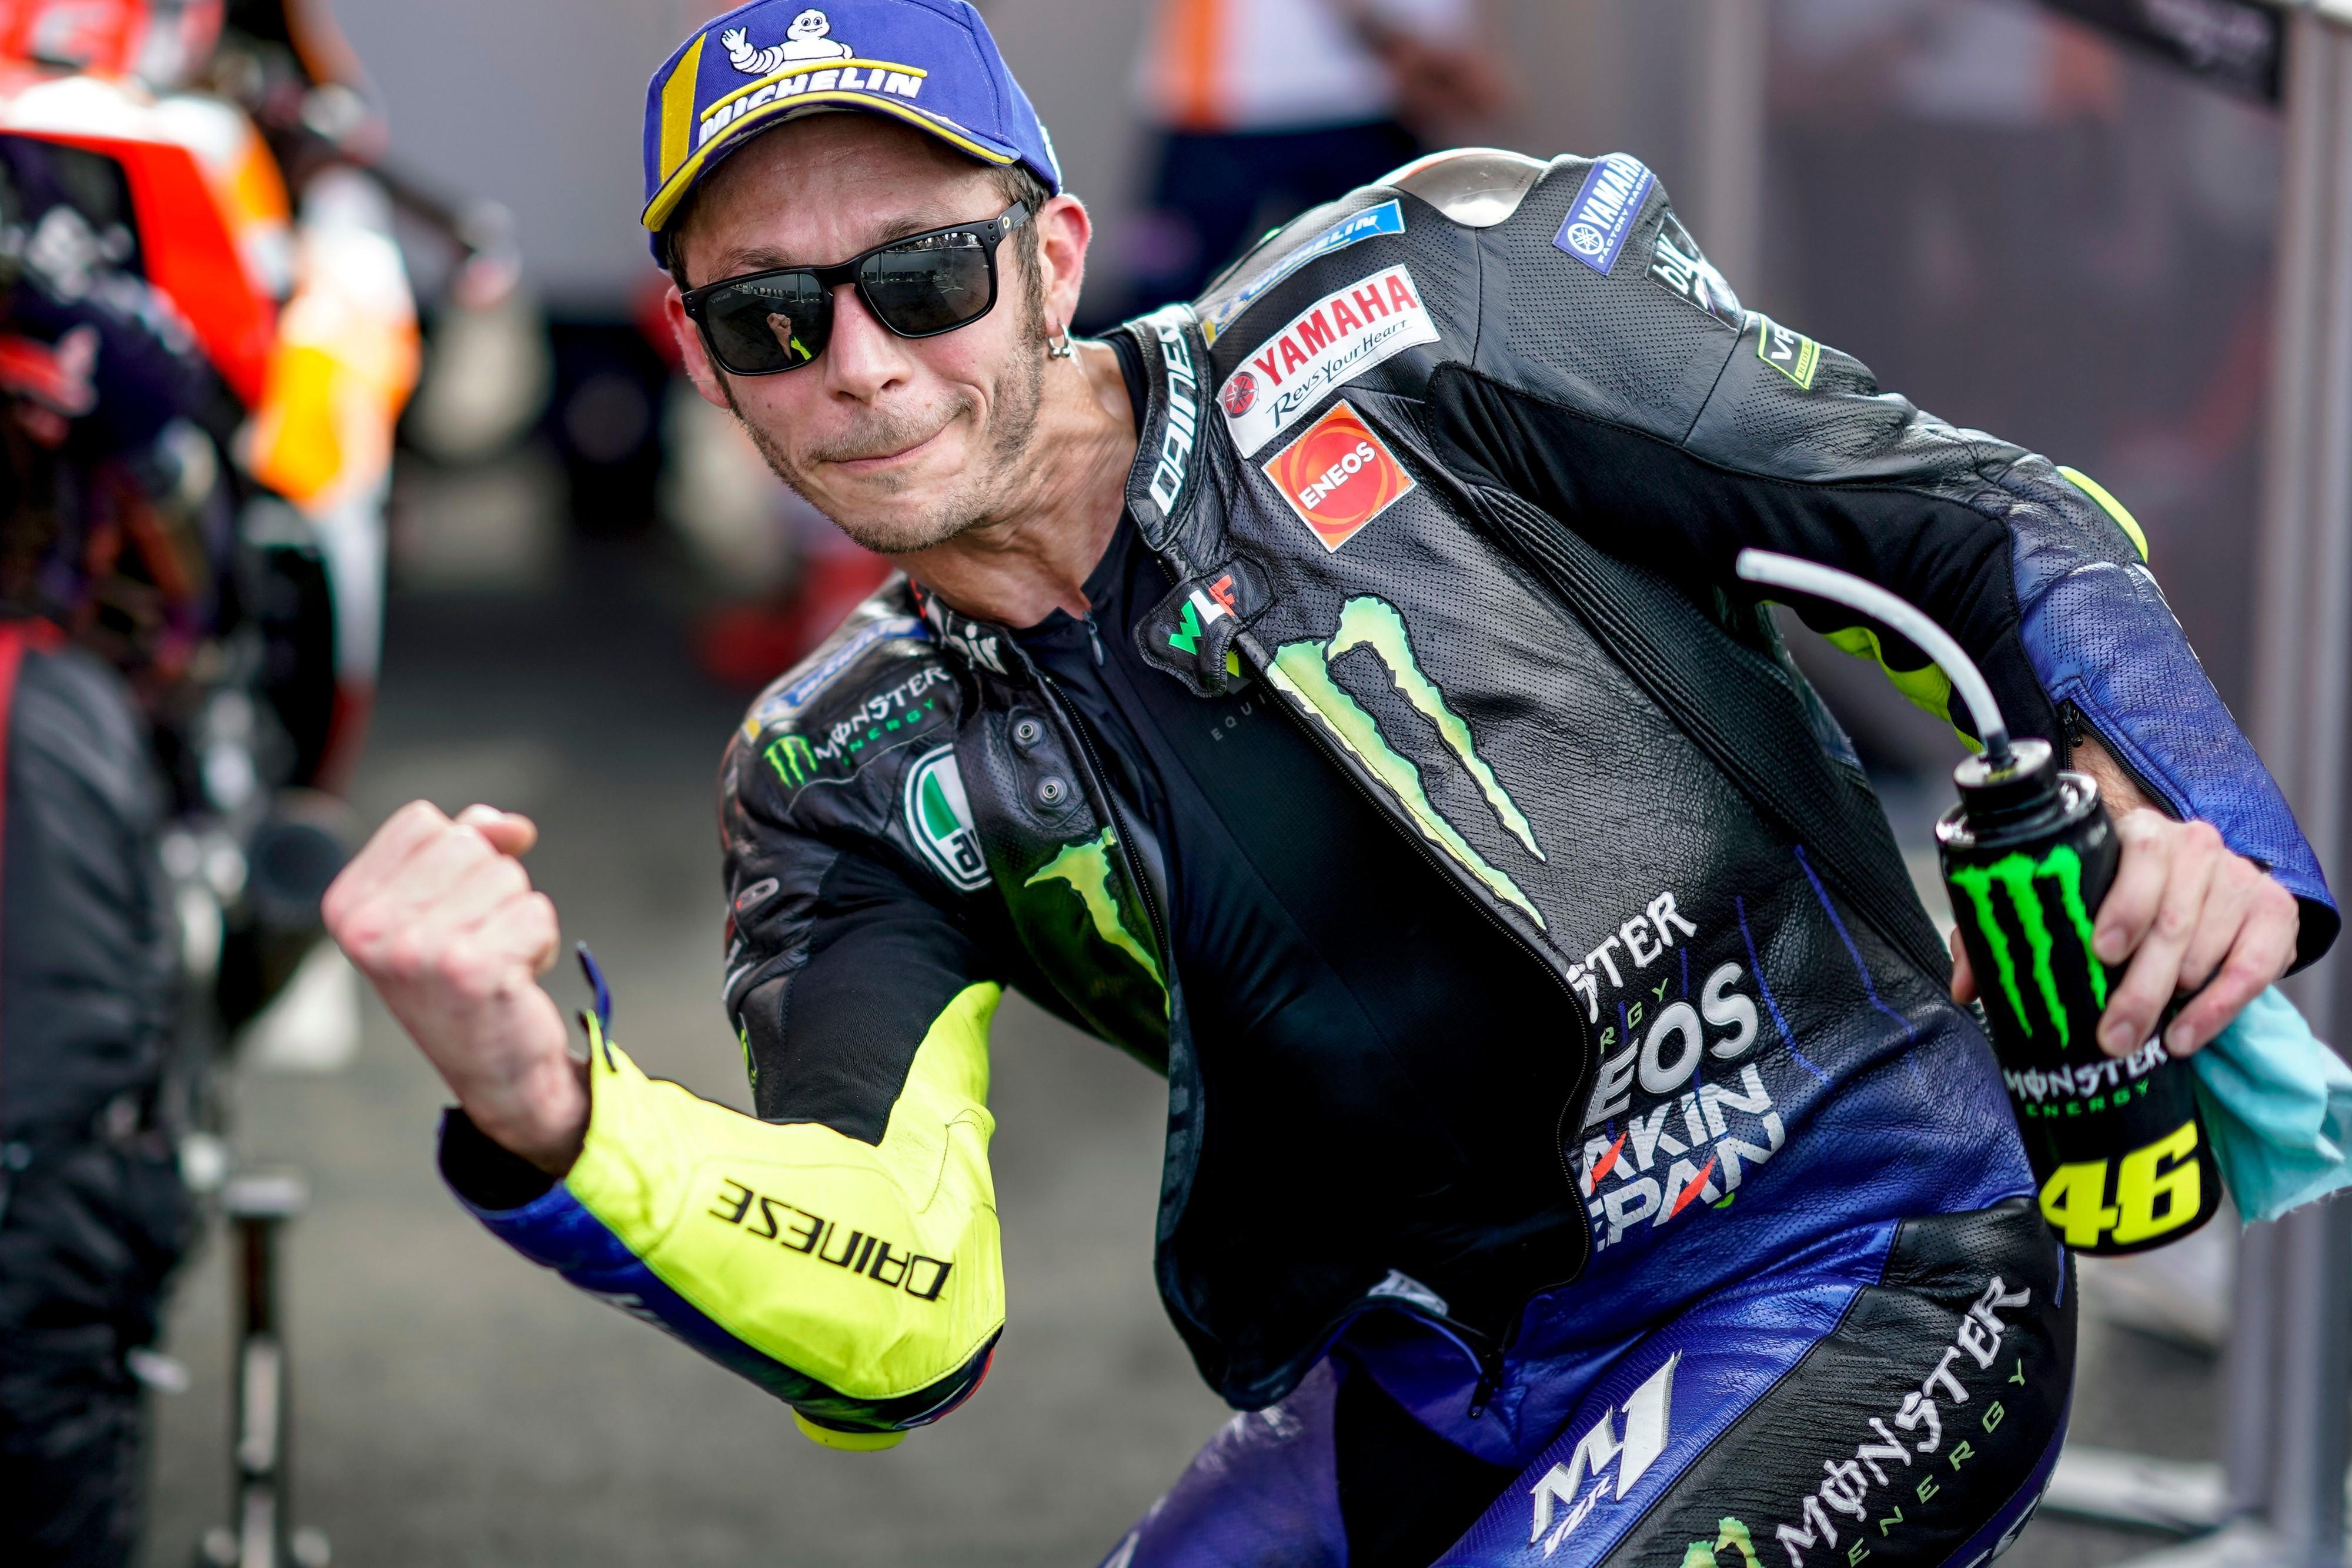 Valentino Rossi (Yamaha Factory) au Grand Prix d'Argentine 2019